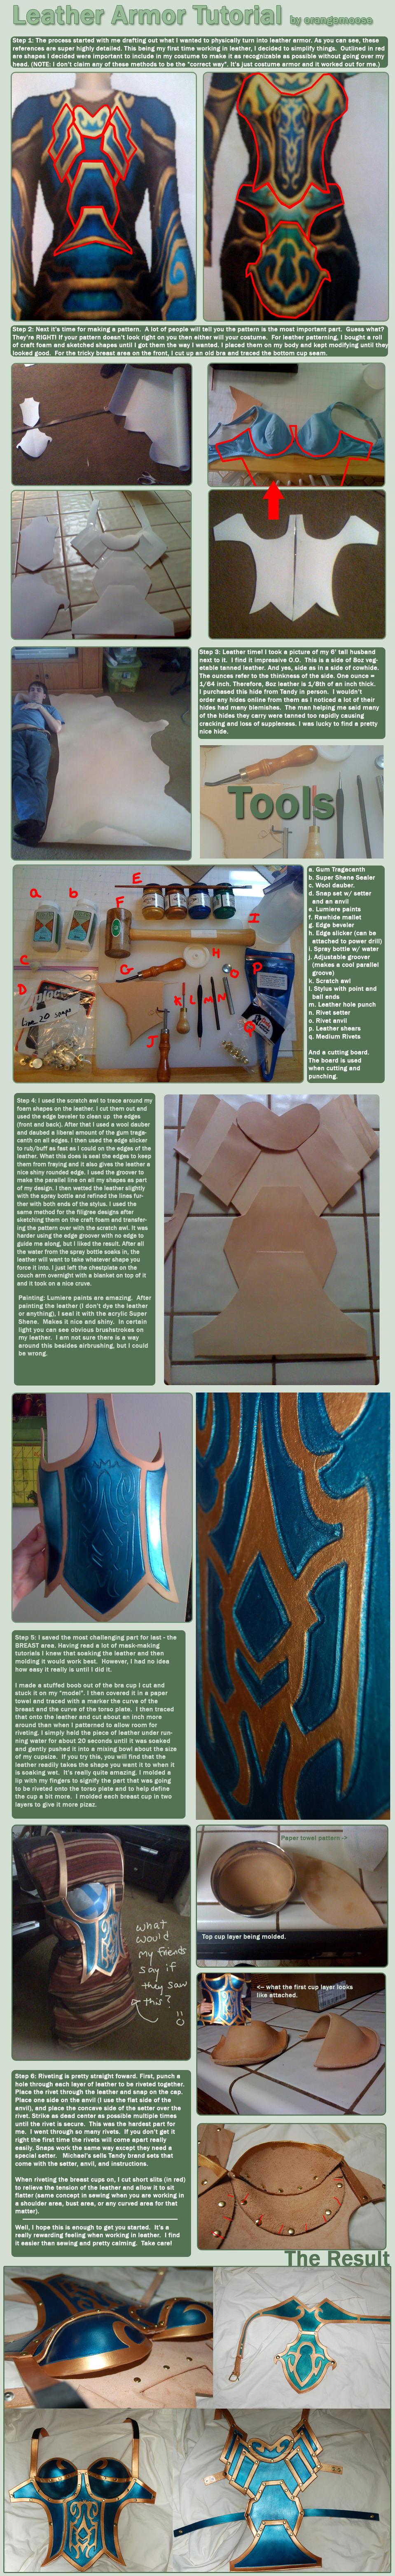 Leather Armor Tutorial by OrangeMoose